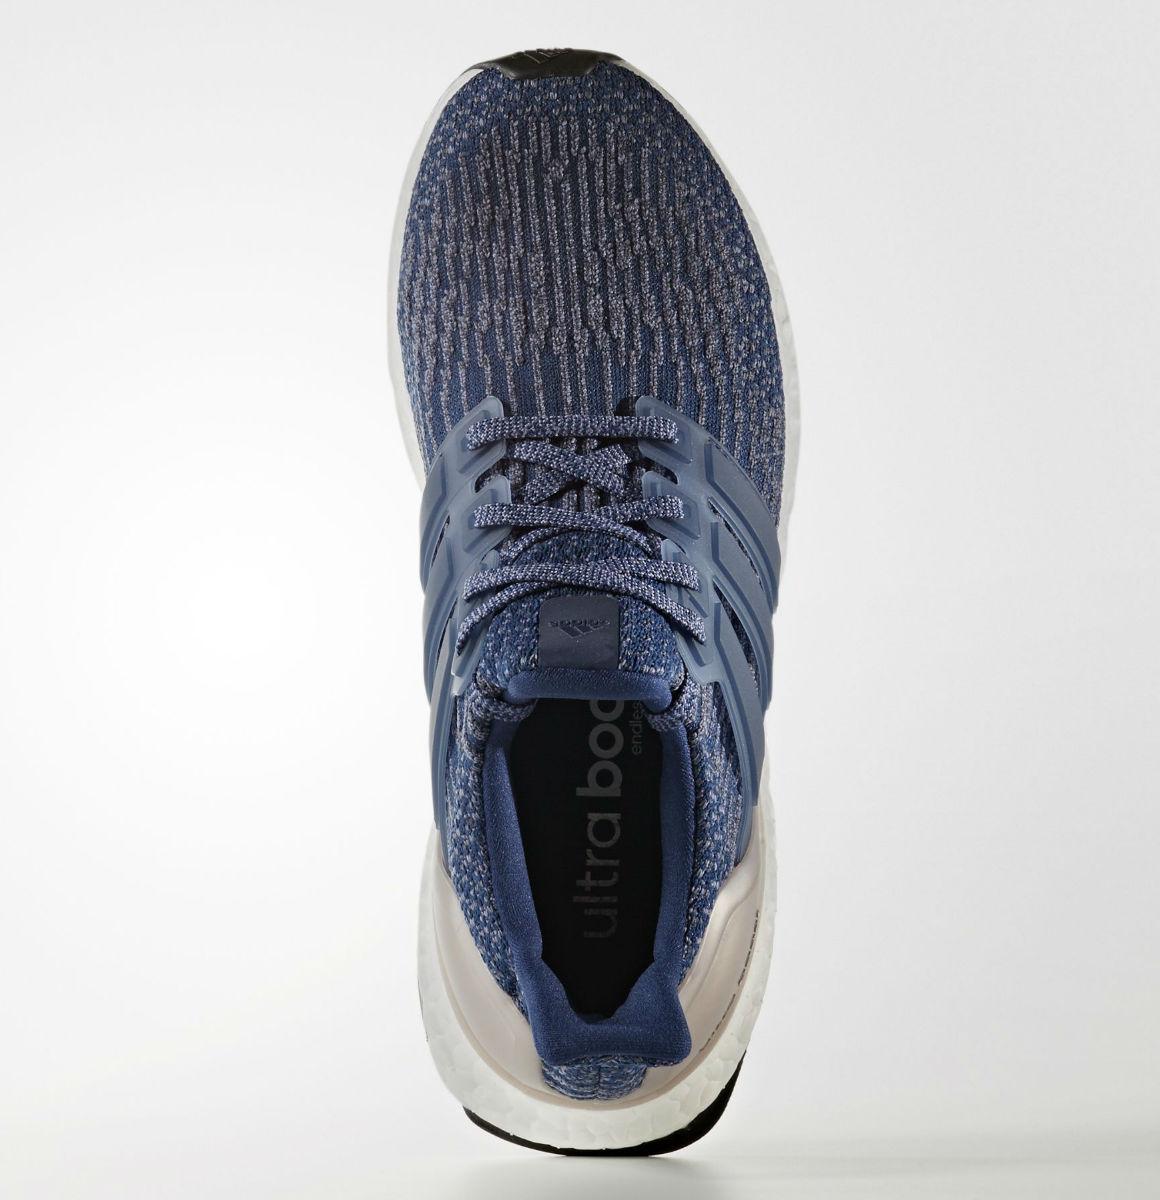 Adidas Ultra Boost Women's Mystery Blue Top BA8928